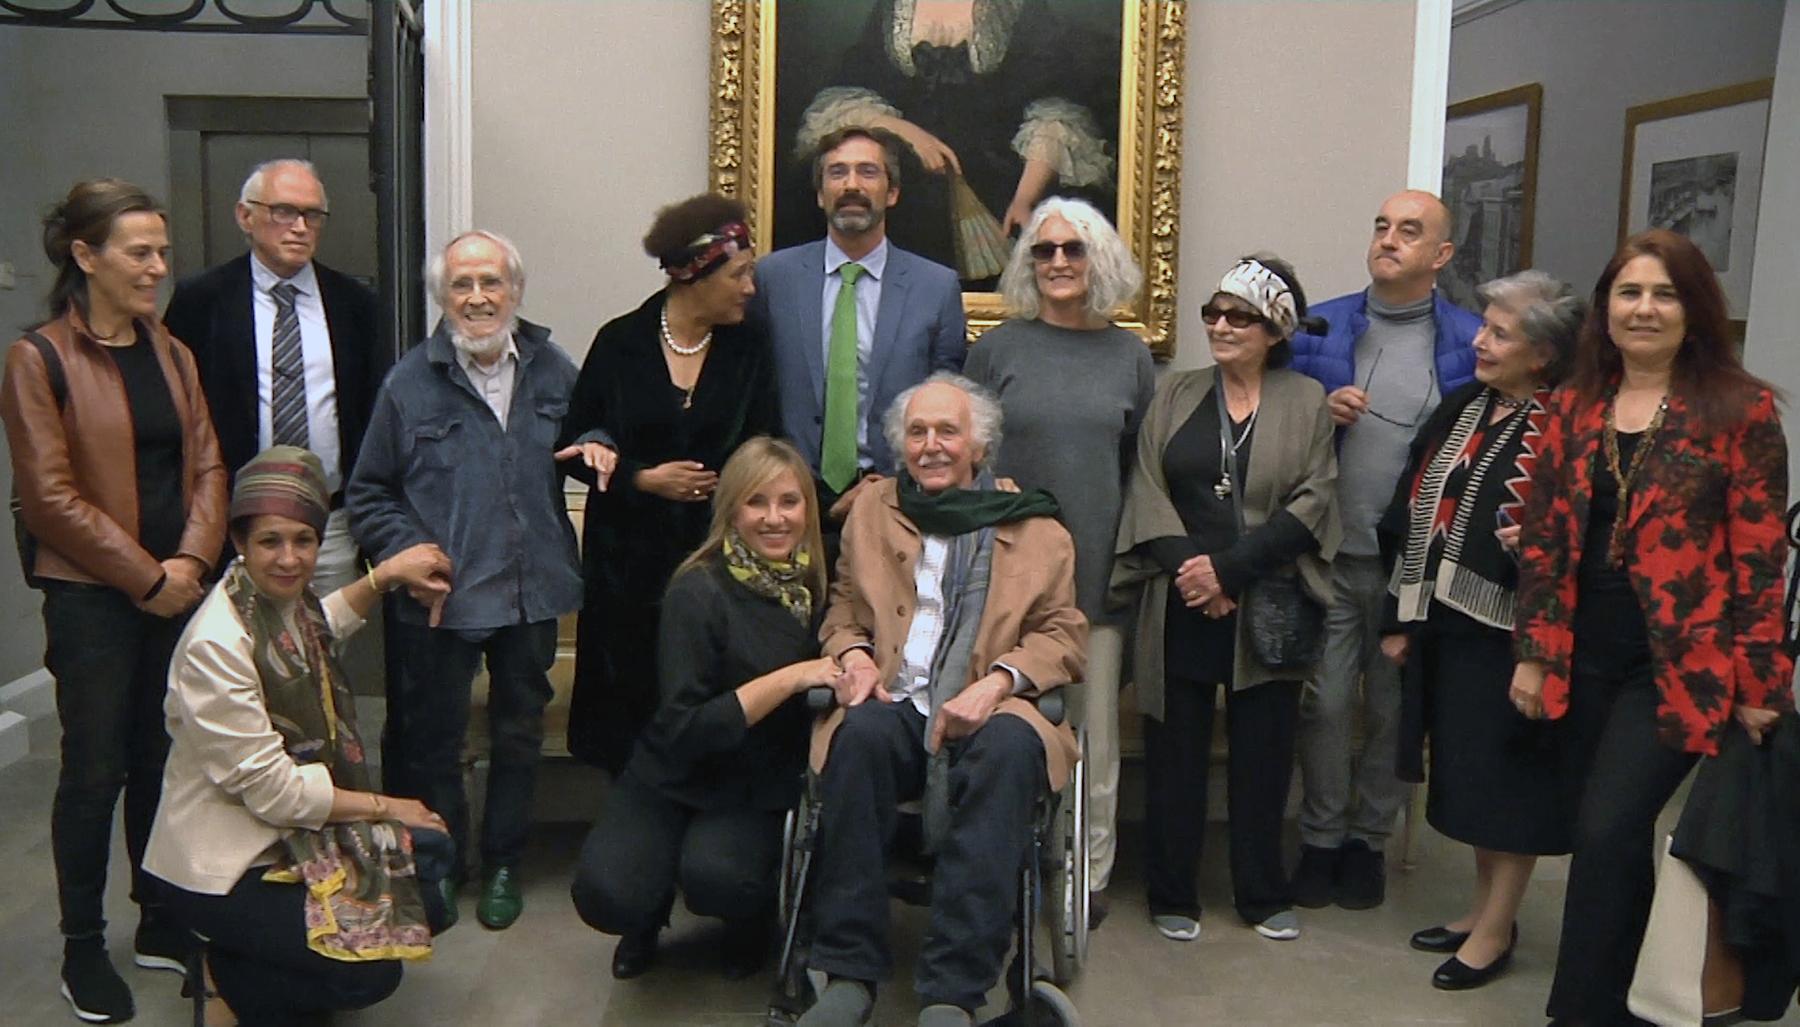 Reunión de artistas homenaje a César Manrique en Madrid